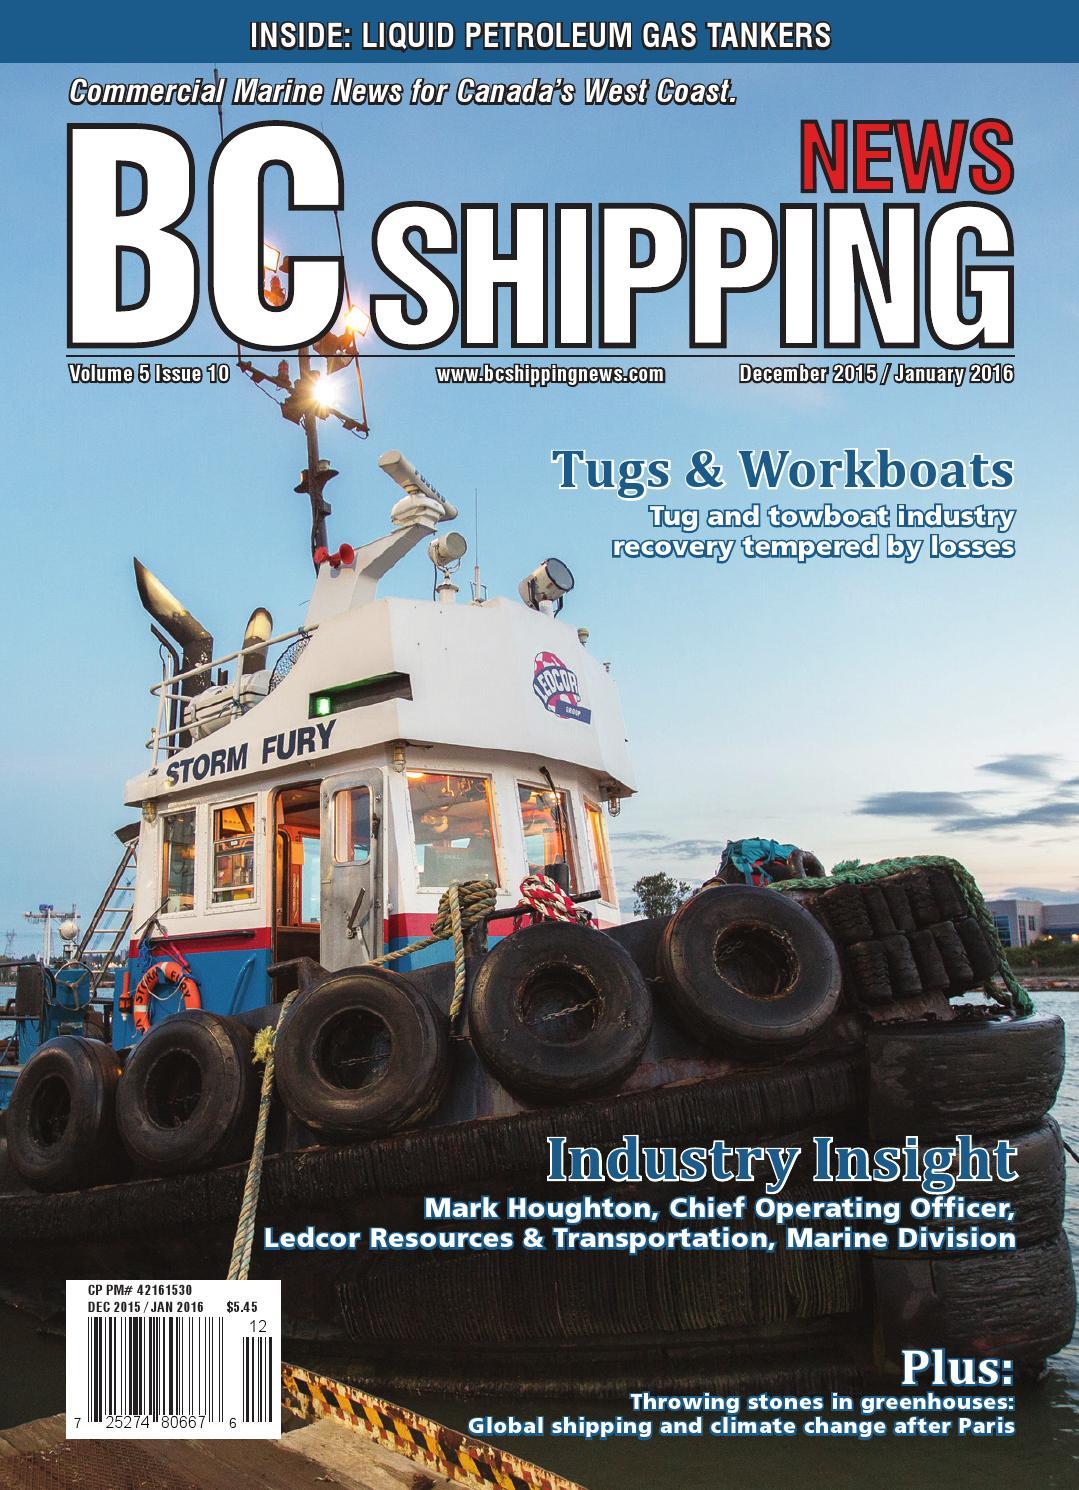 bc shipping news by bc shipping news bc shipping news 2015 2016 by bc shipping news issuu